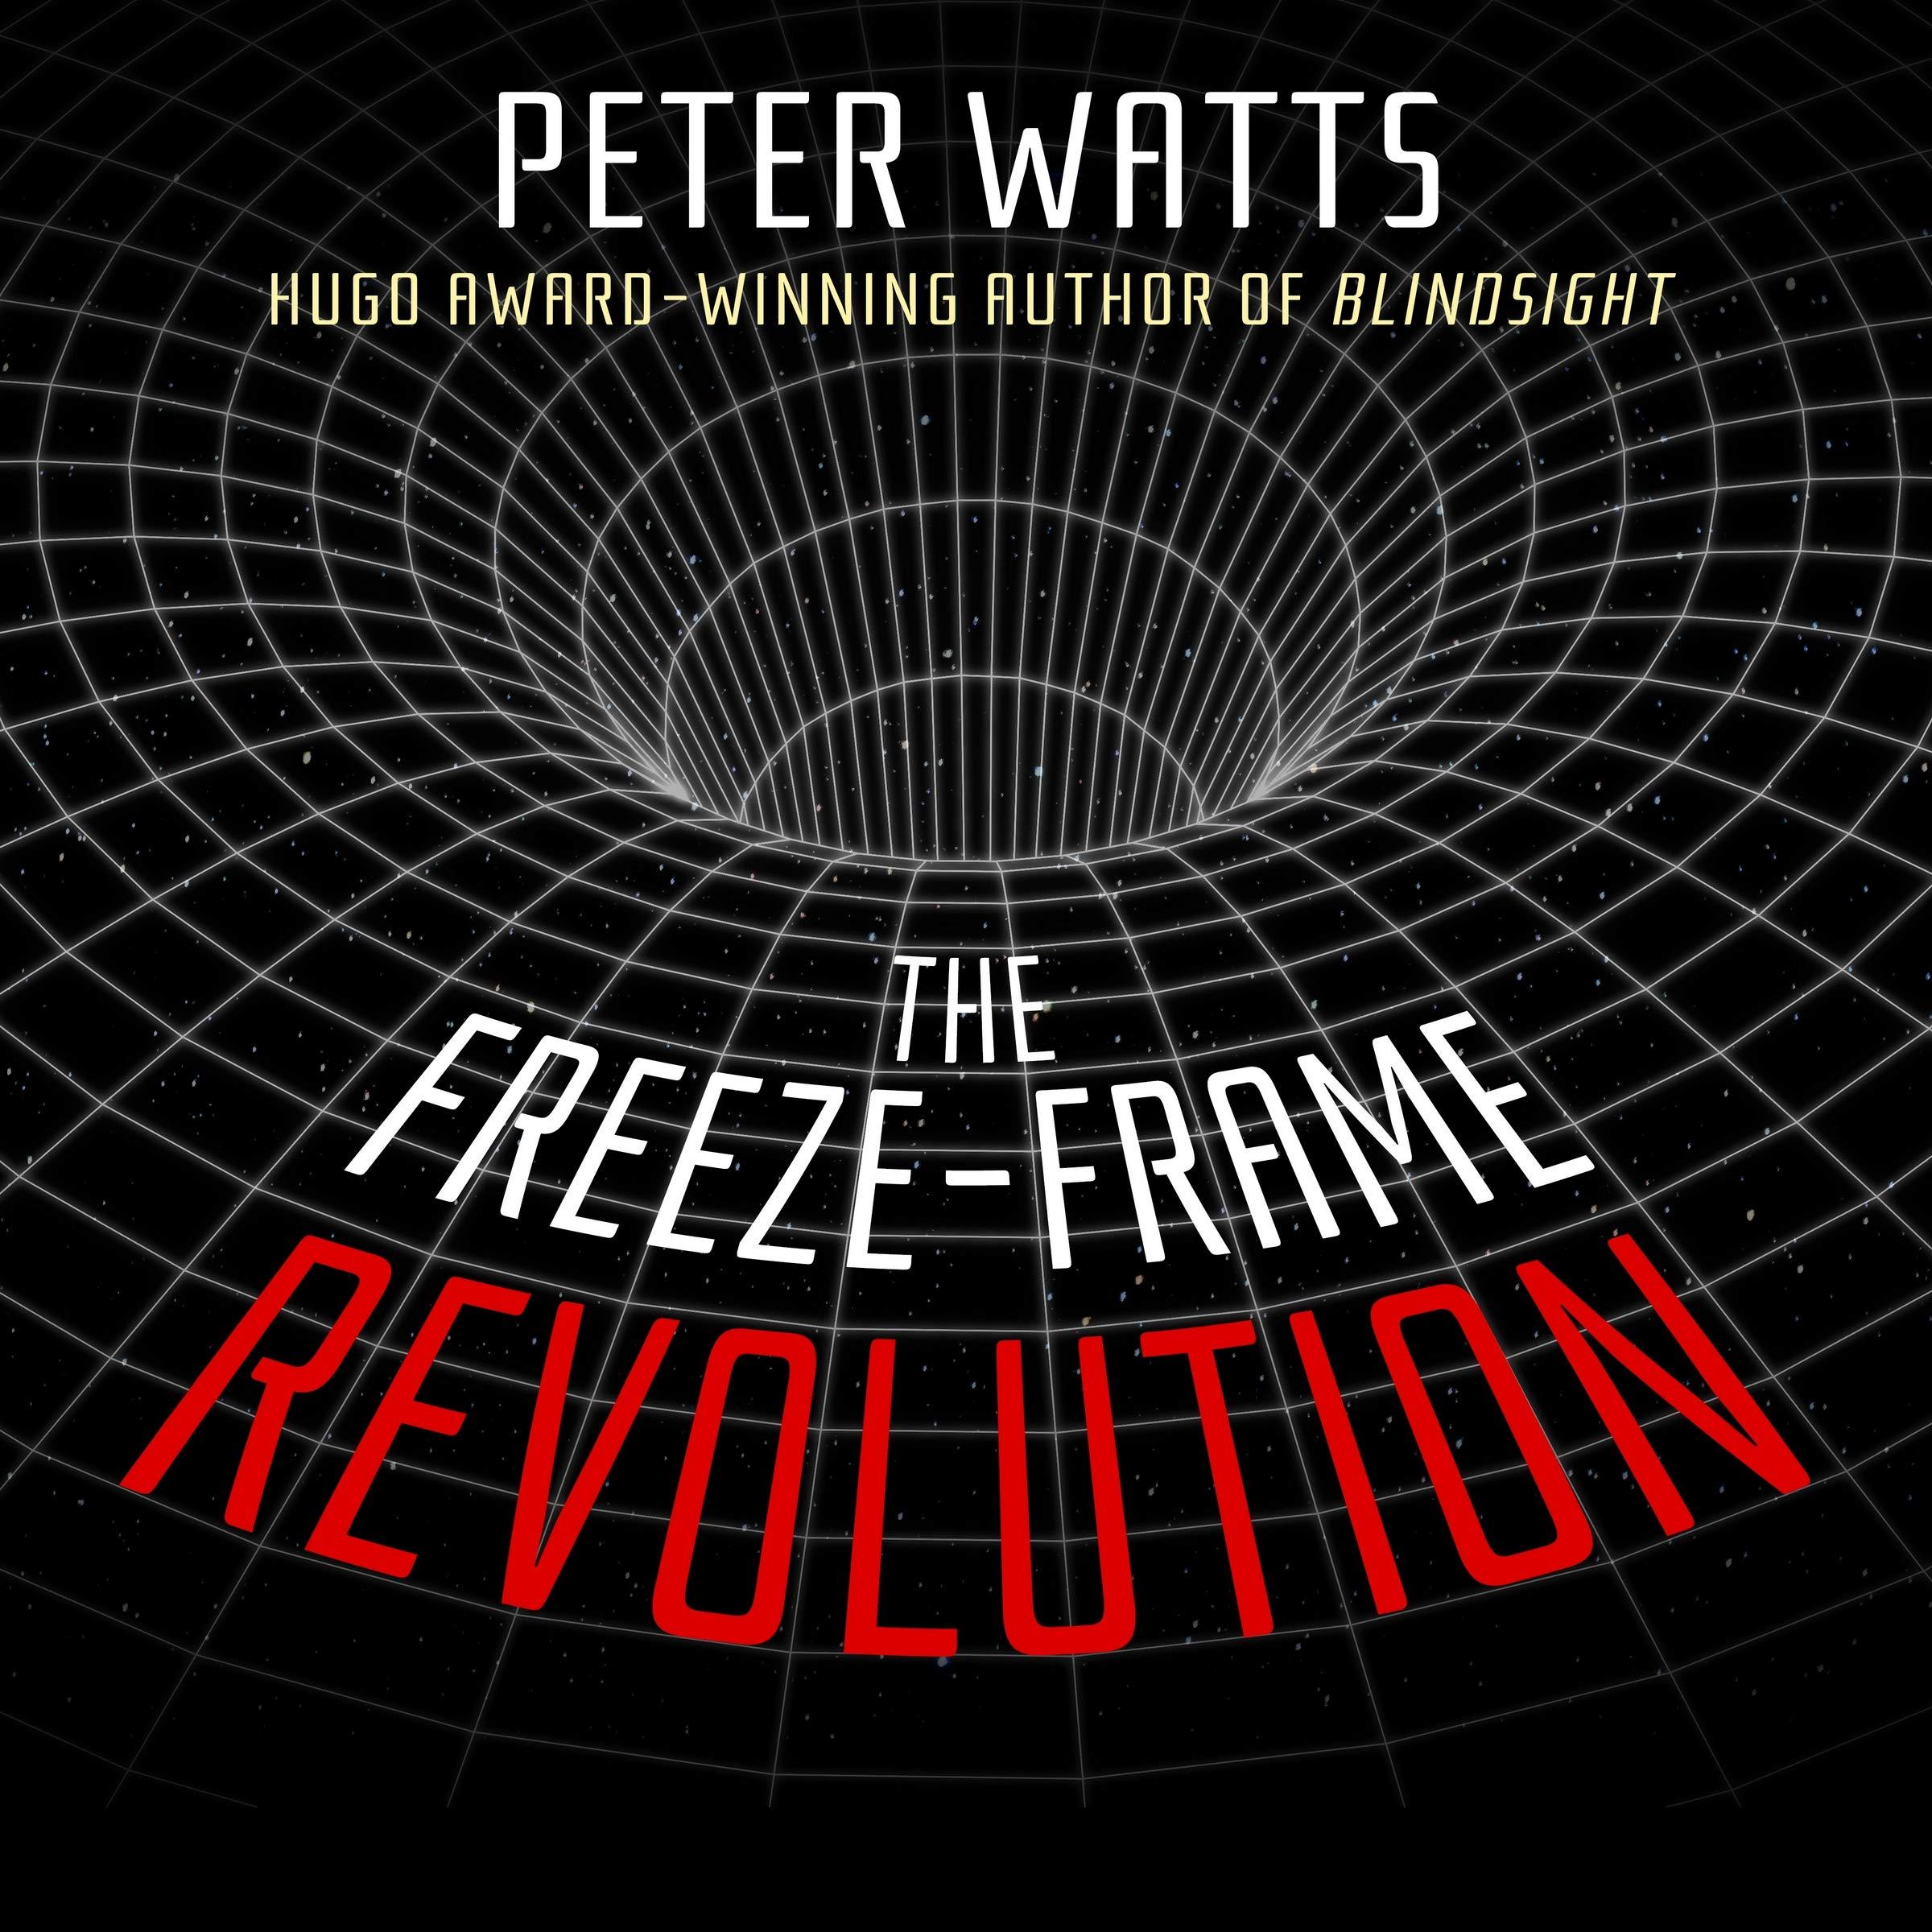 The Freeze-Frame Revolution PDF